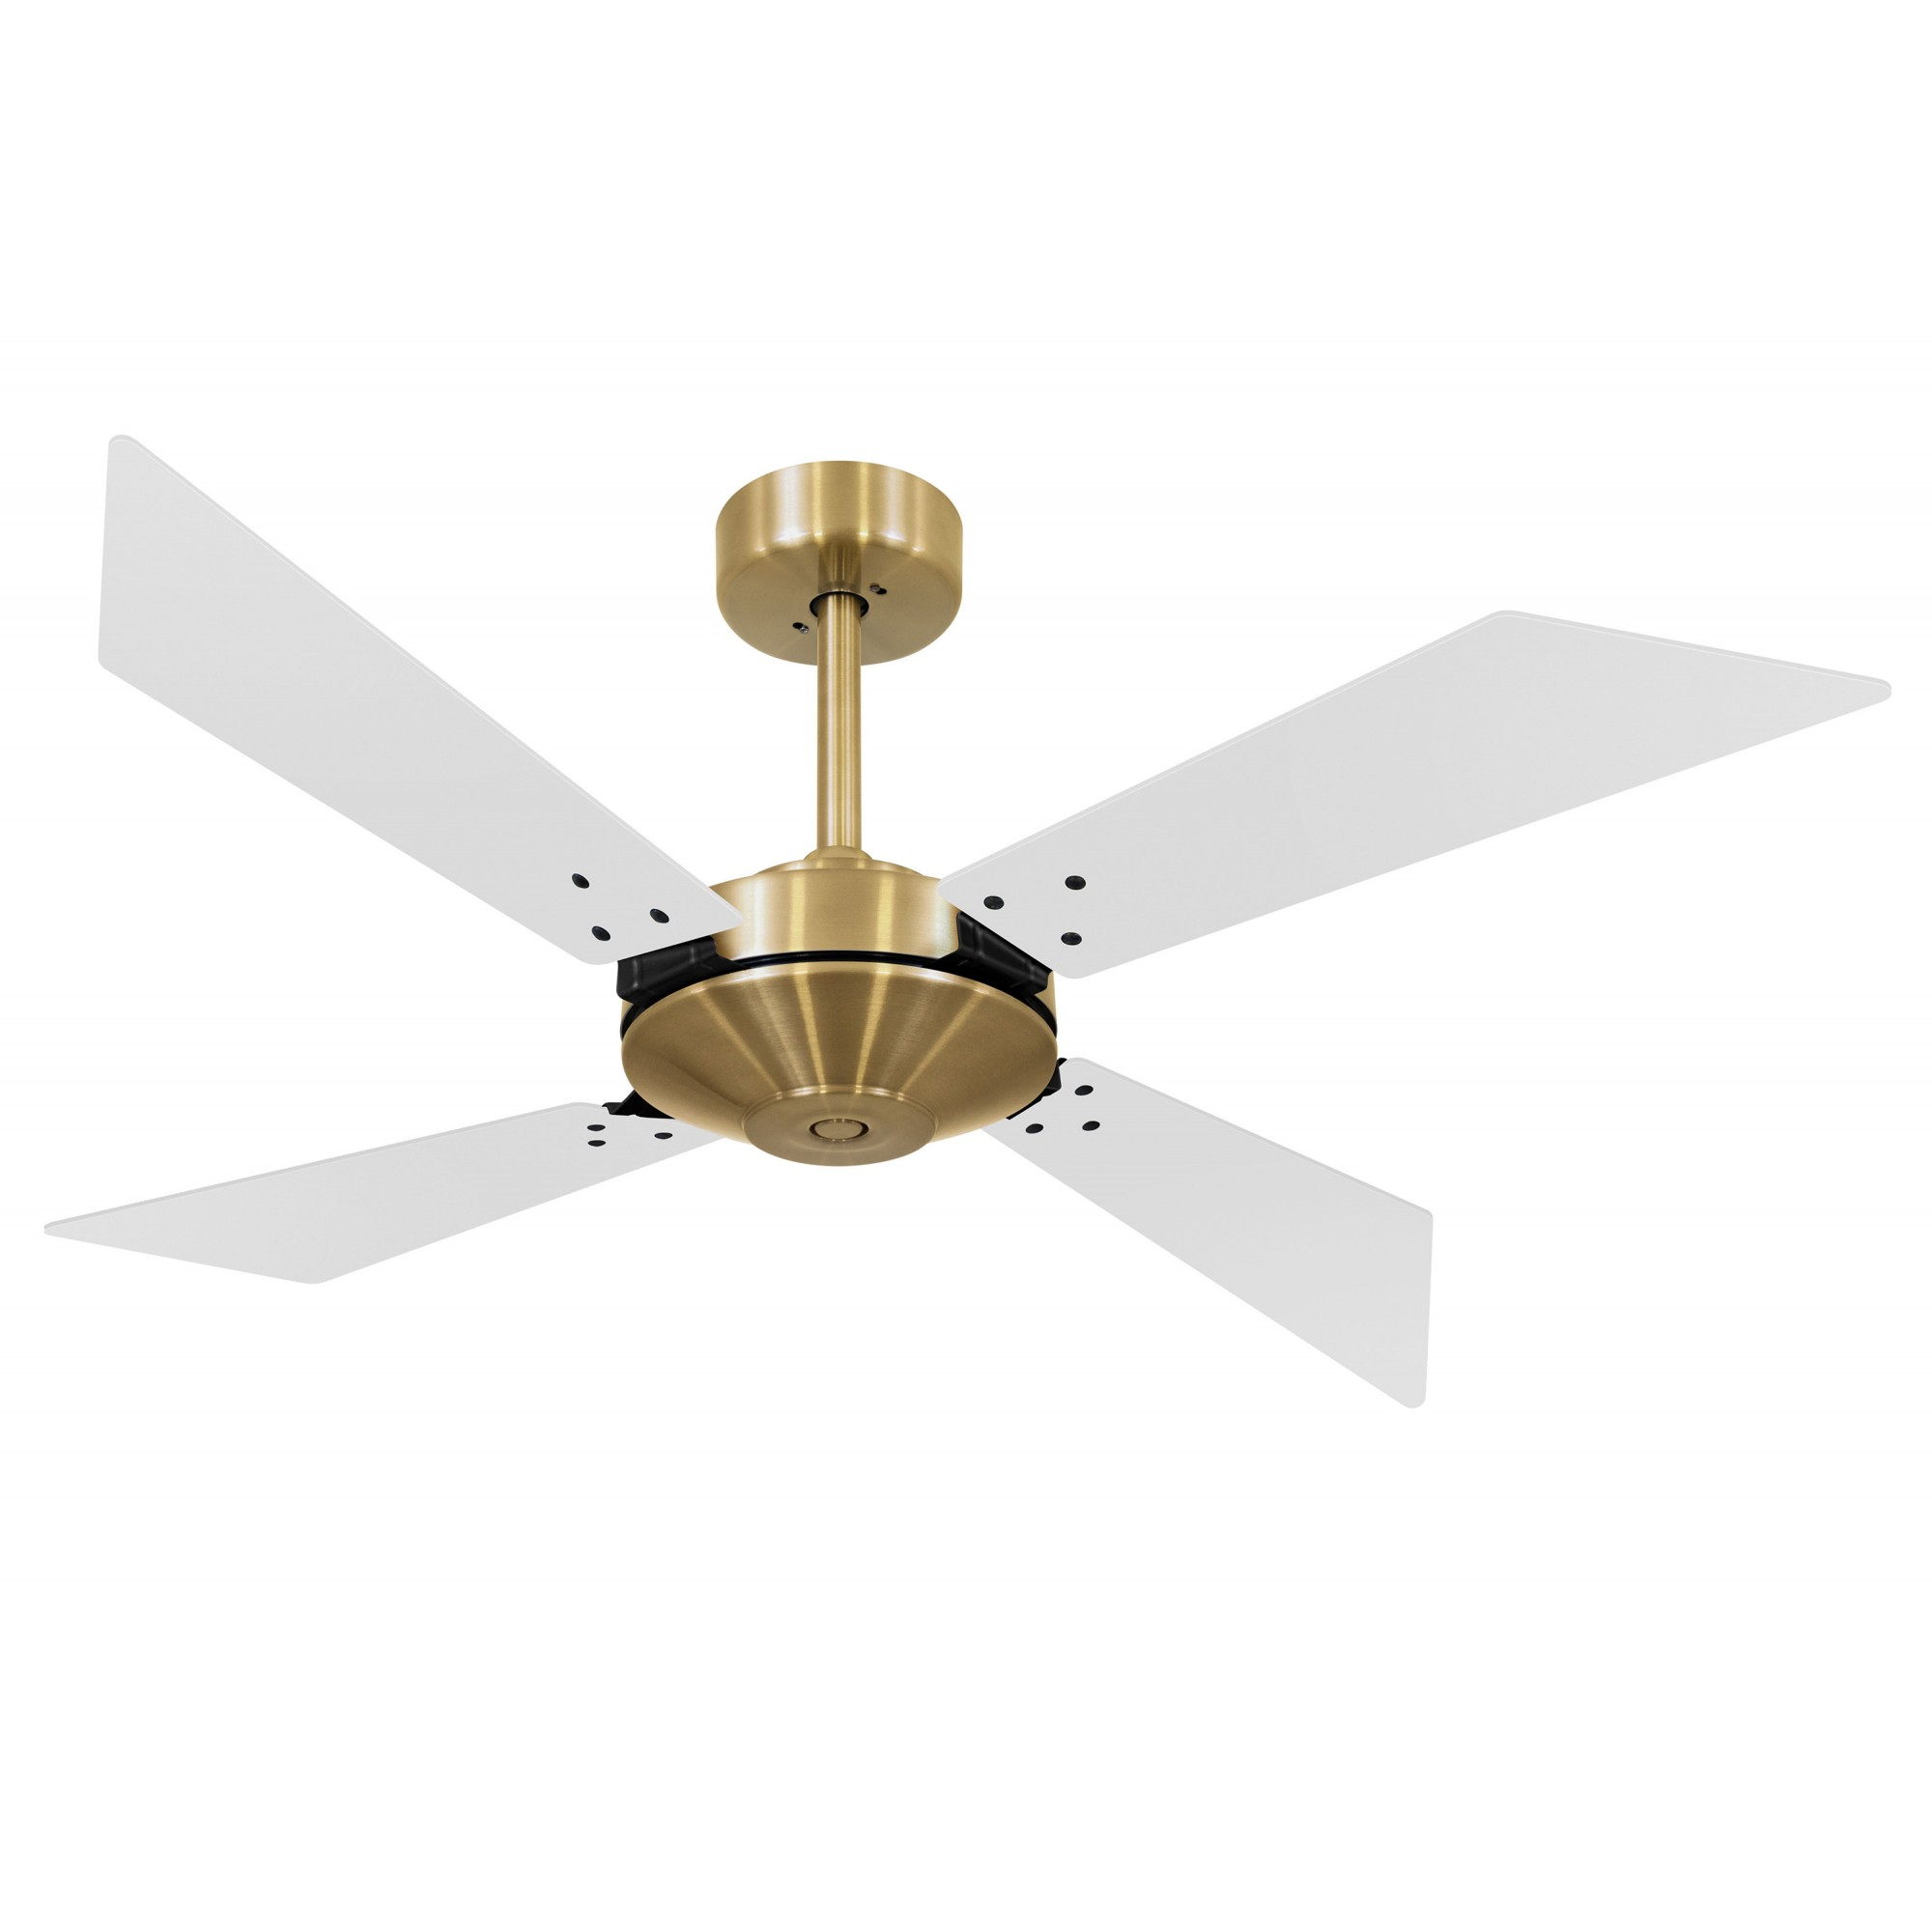 Ventilador de Teto Office Tech Dourado 4 Pás MDF Branco 110V